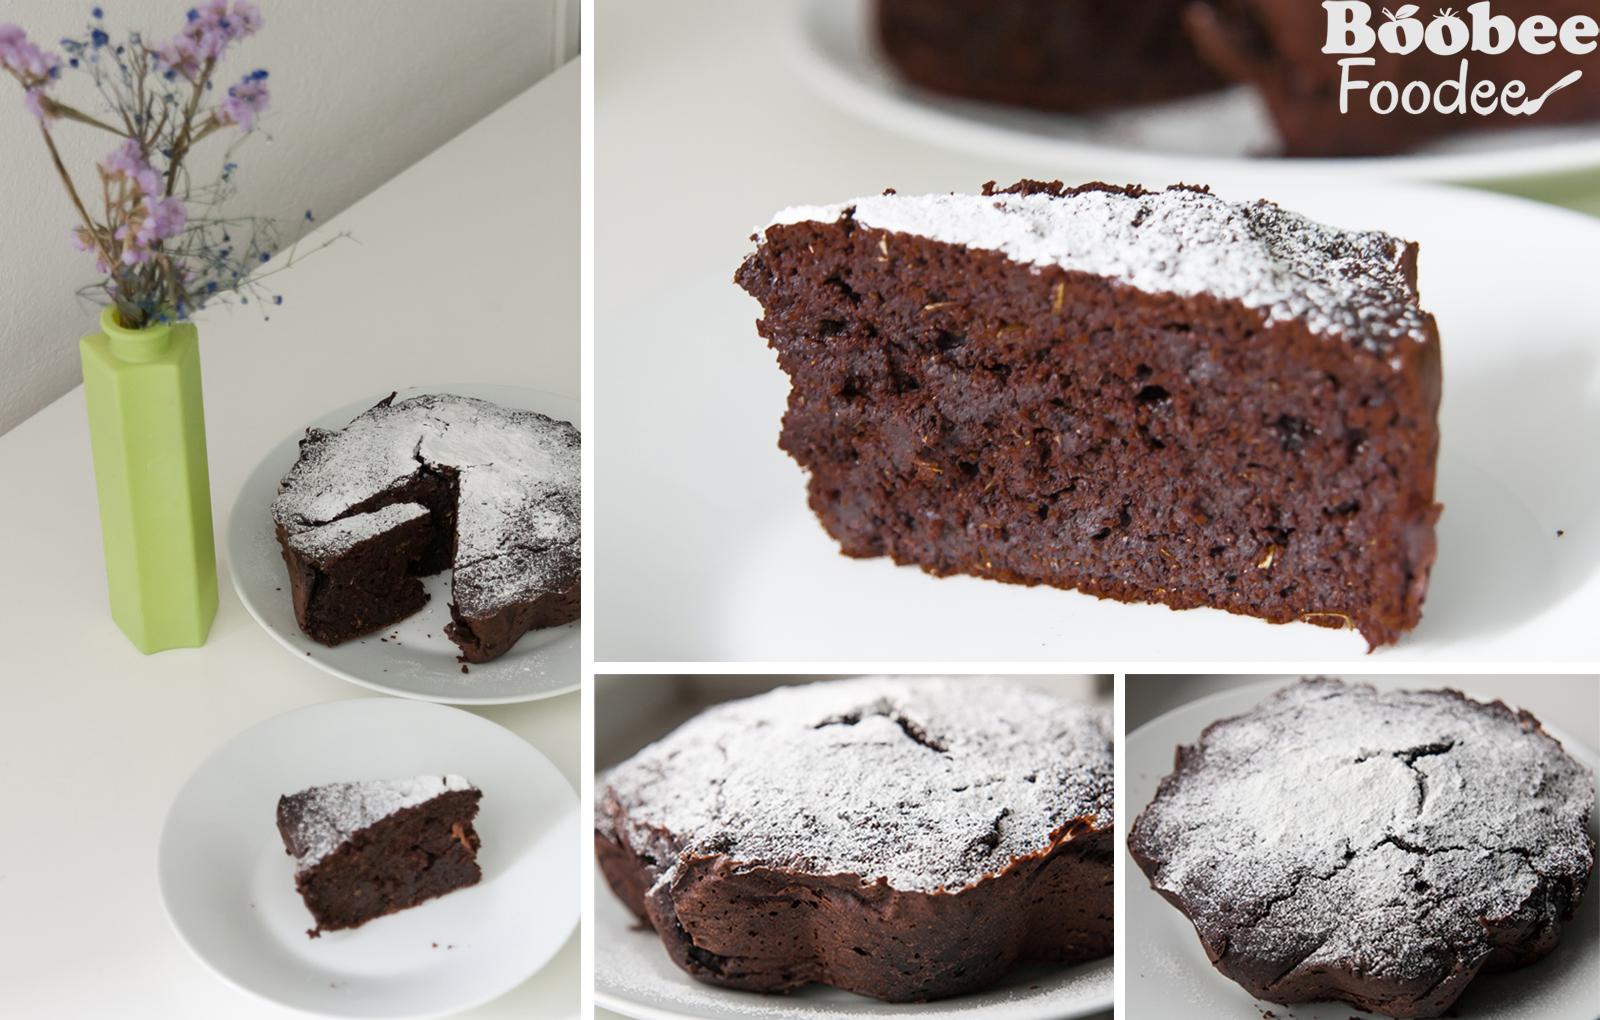 buckin cokoladni kolac_wm